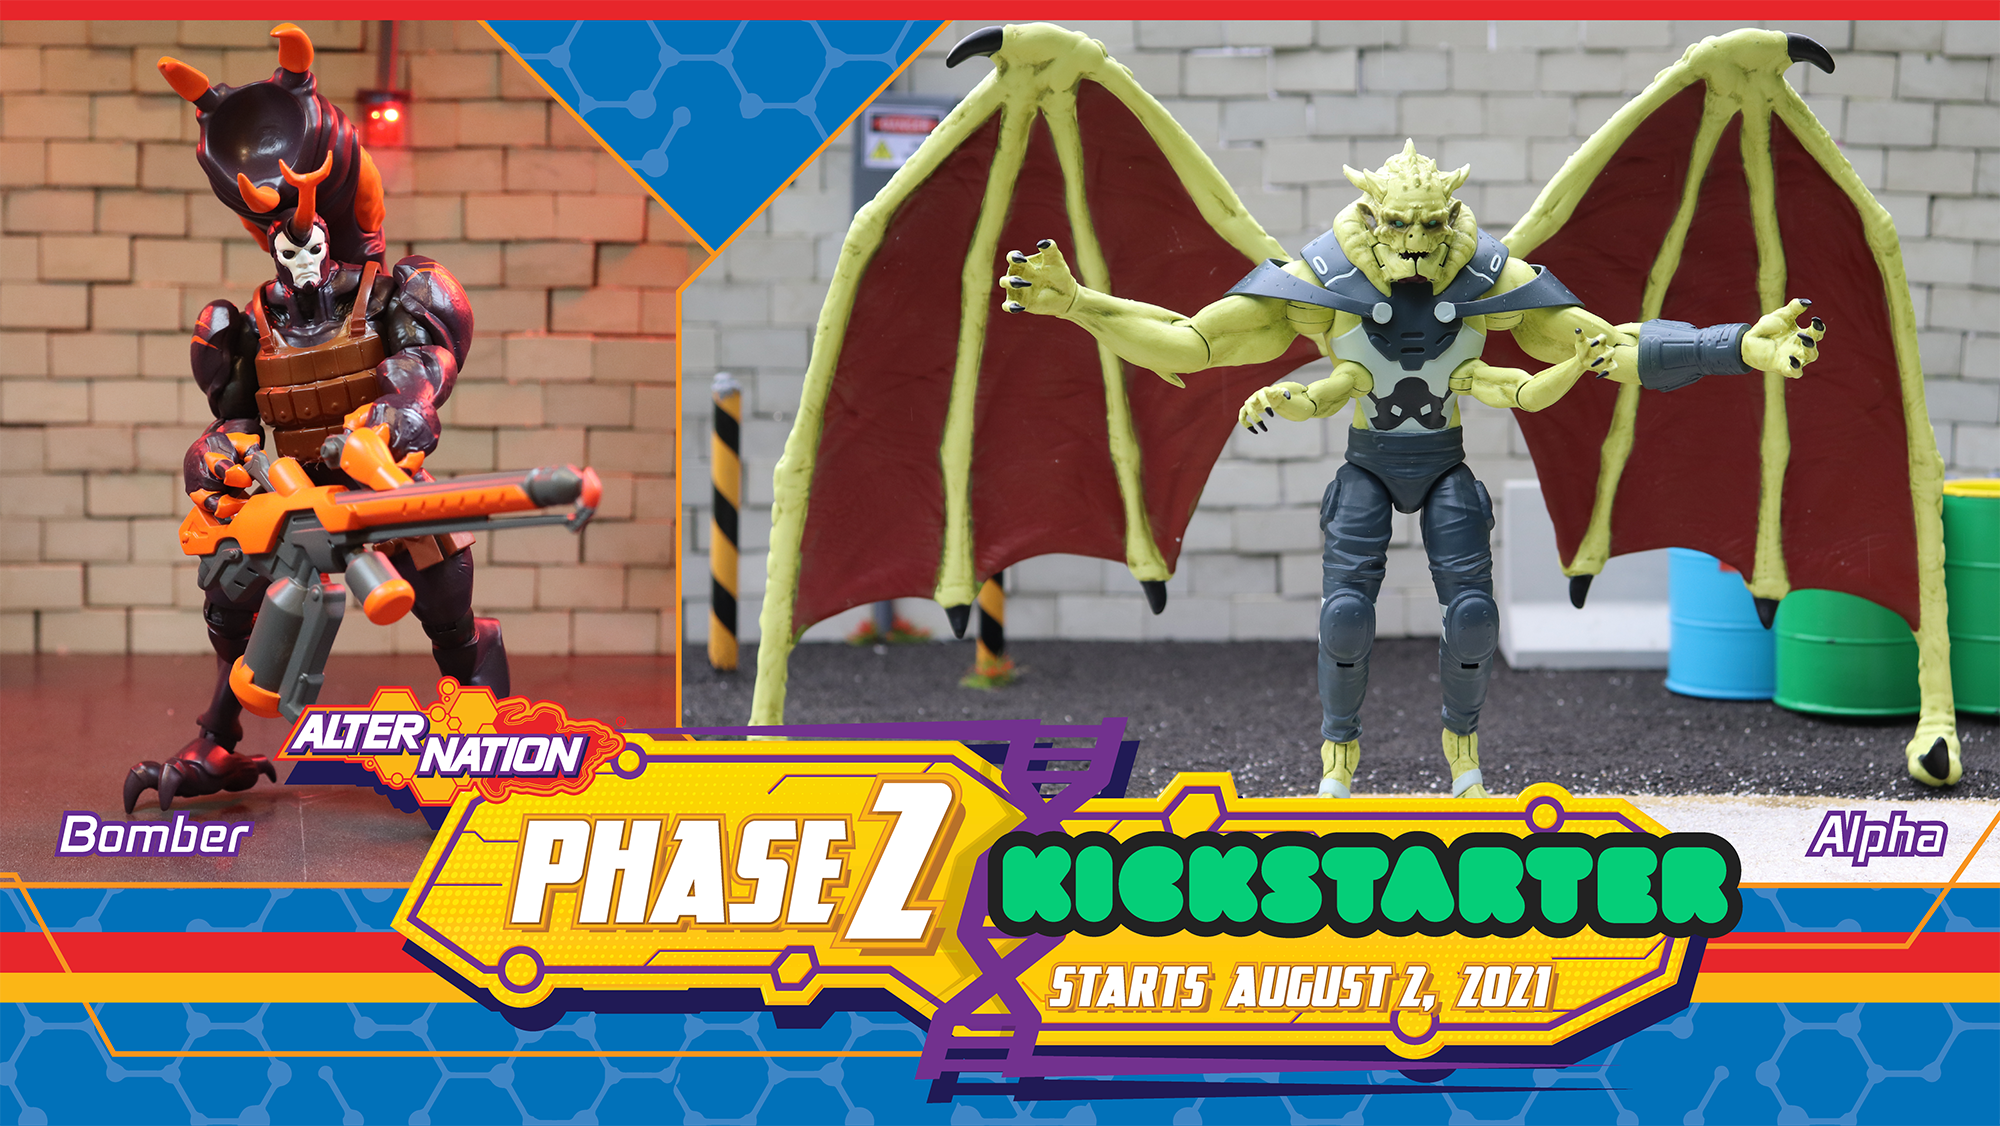 PandaMony Toys – Alter Nation Phase II Figures Kickstarter Campaign Ends Sept. 1, 2021